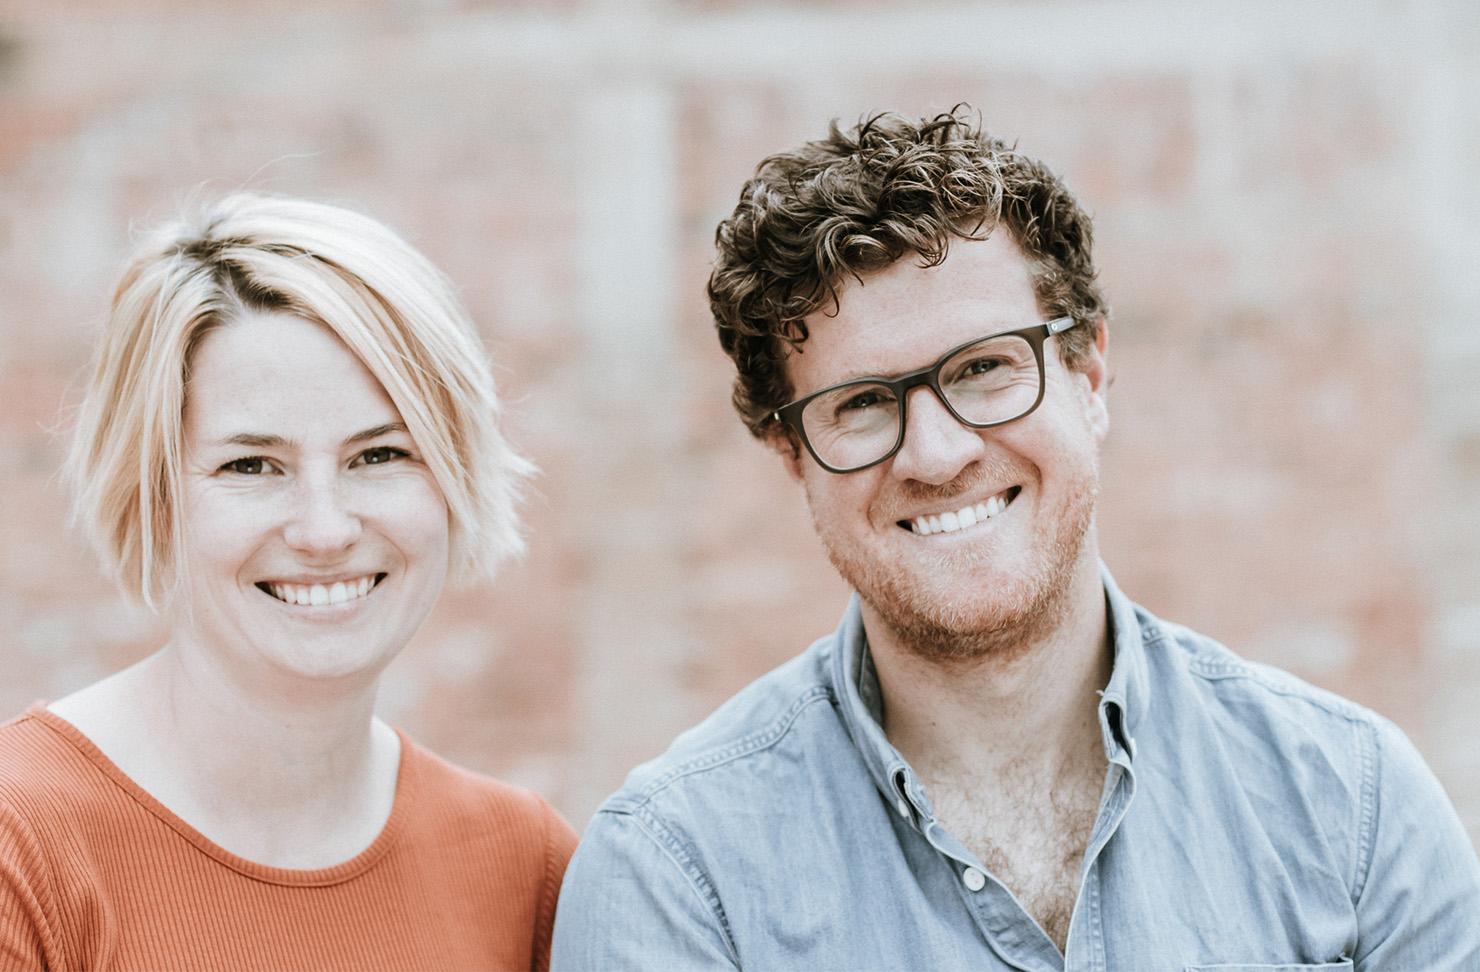 Applewood founders Brendan and Laura Carter